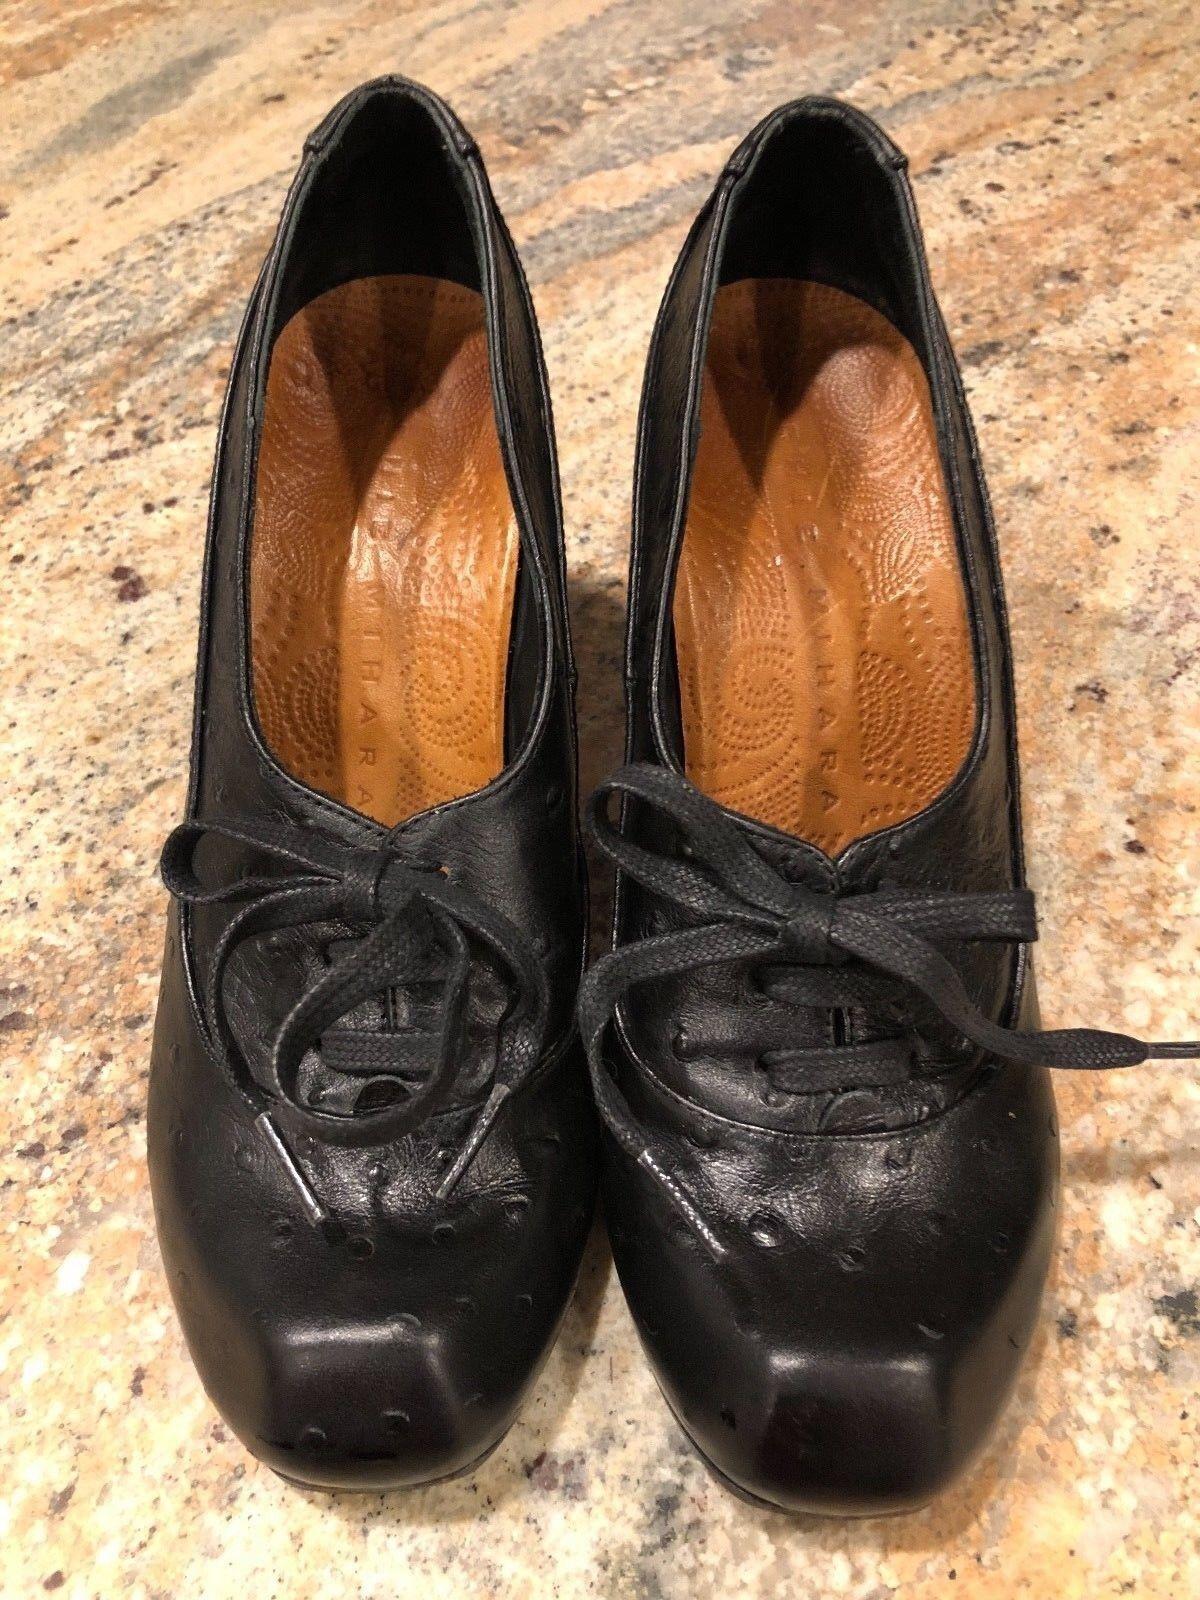 BIRKENSTOCK SAITAMA Leather PENNY LOAFER Nero 6.5 Size 37 6 - 6.5 Nero US Narrow NEW c00de5